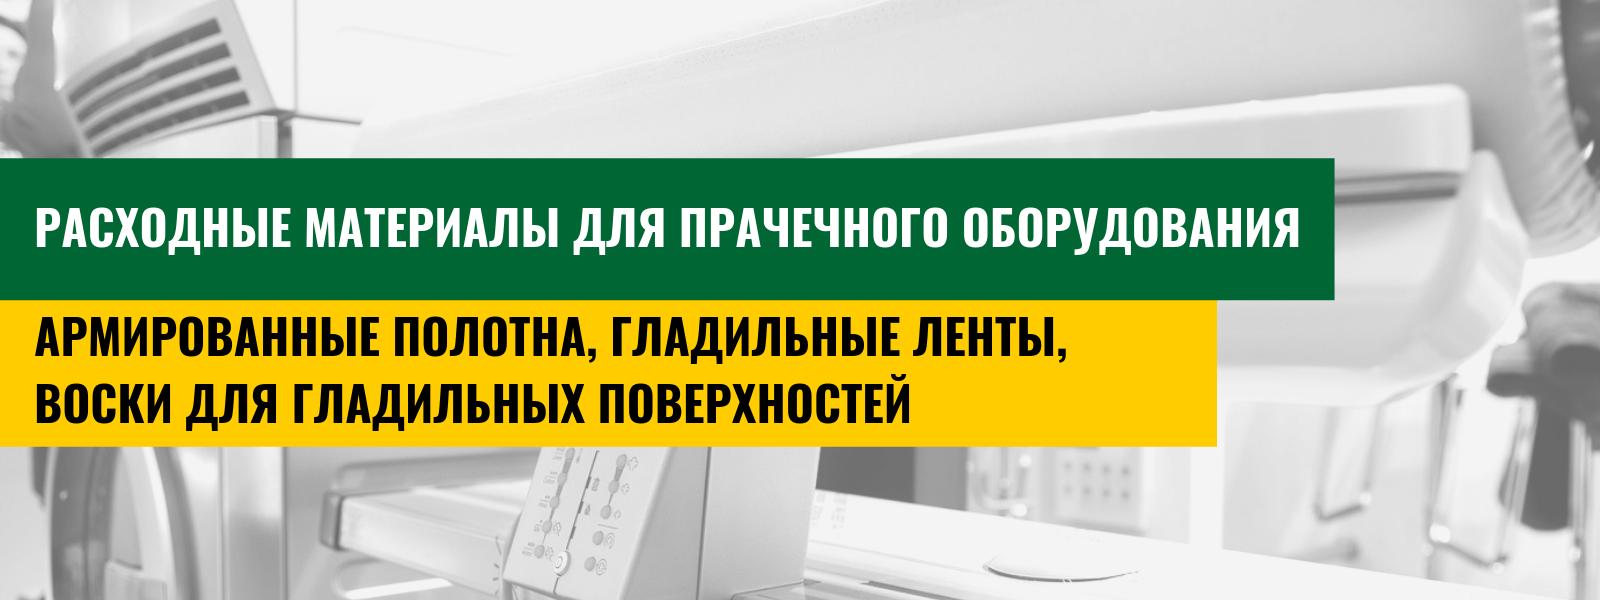 баннер_расходники